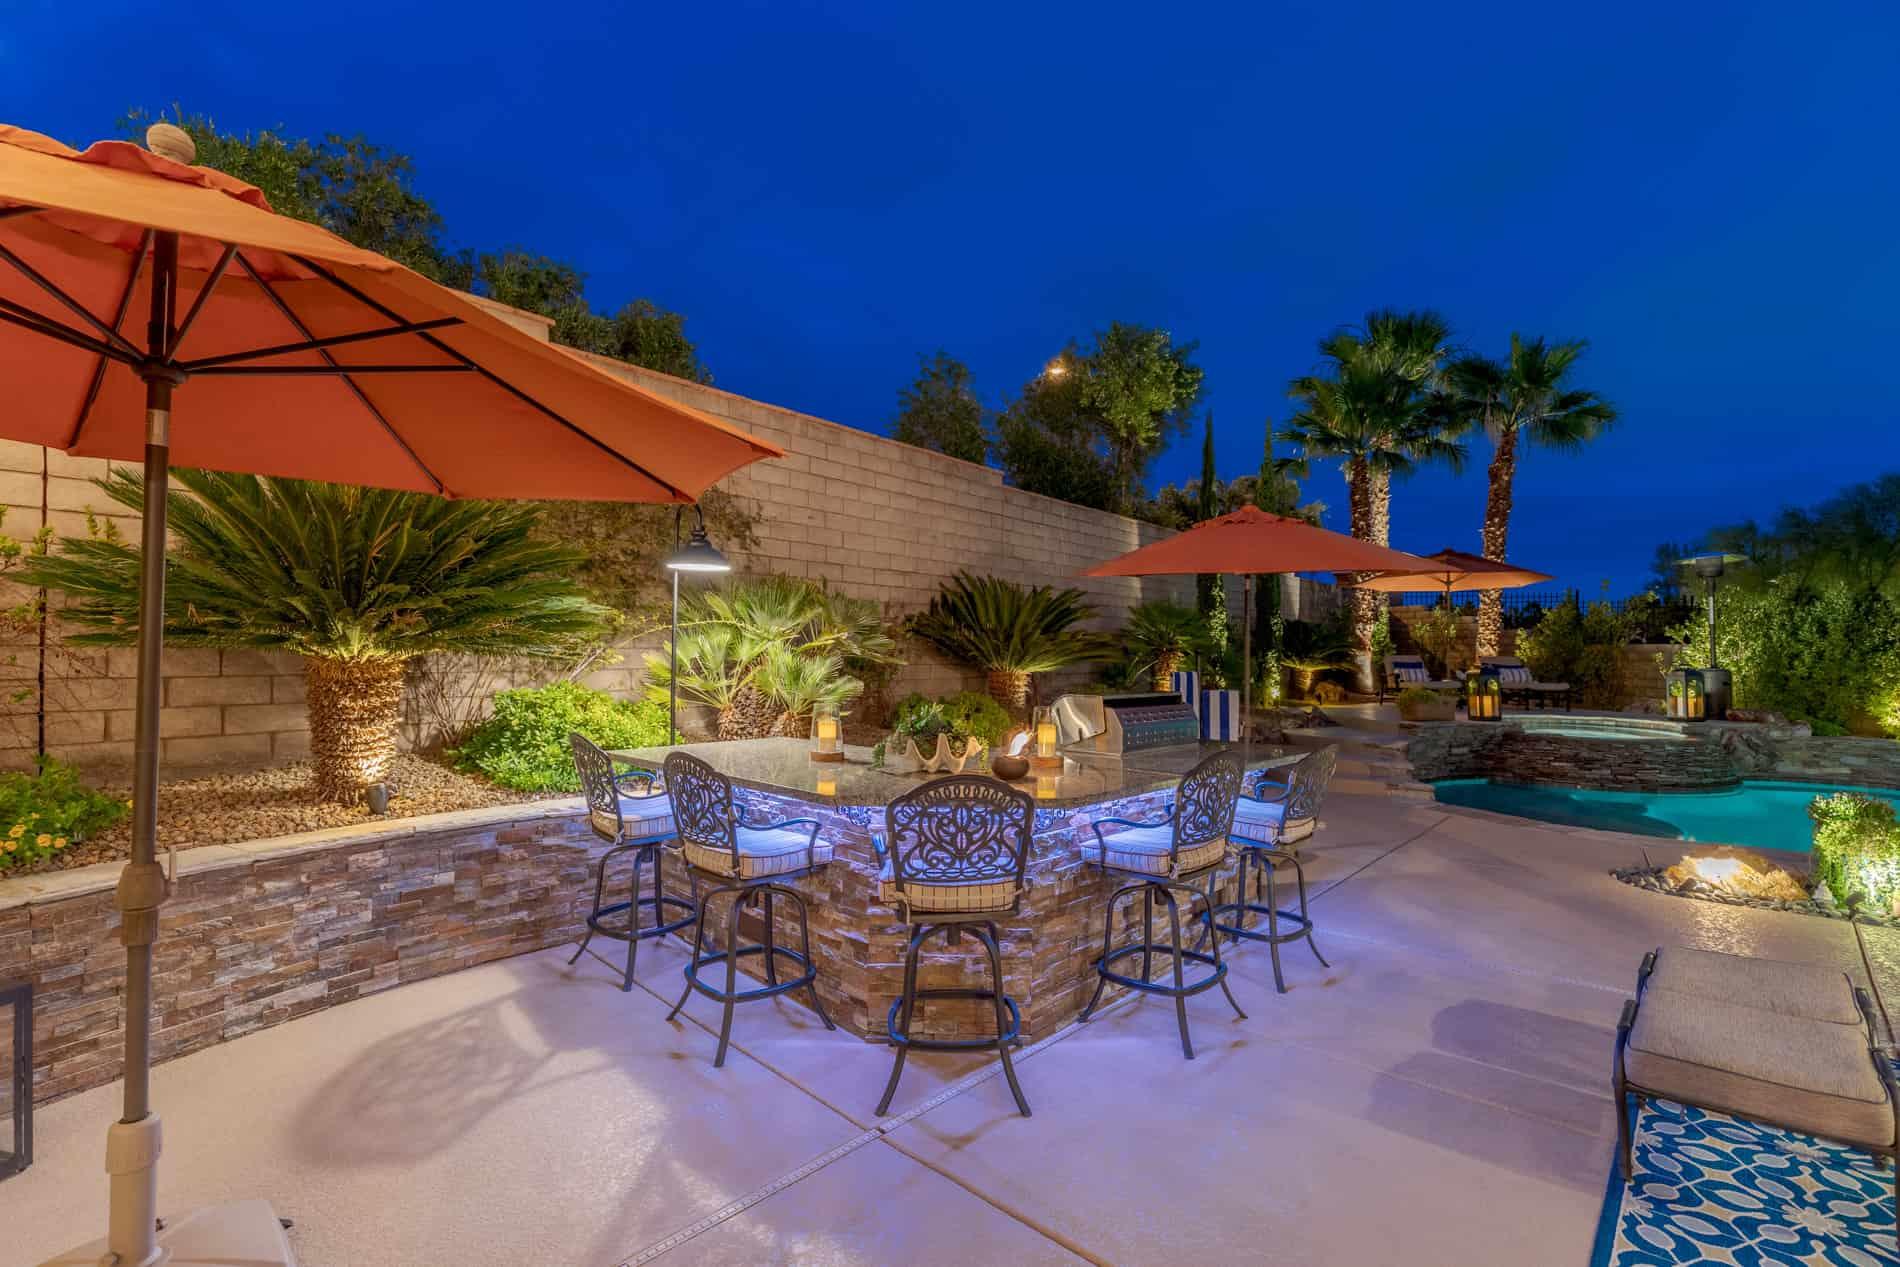 las-vegas-luxry-real-estate-realtor-rob-jensen-company-12108-vista-linda-avenue-the-paseos095